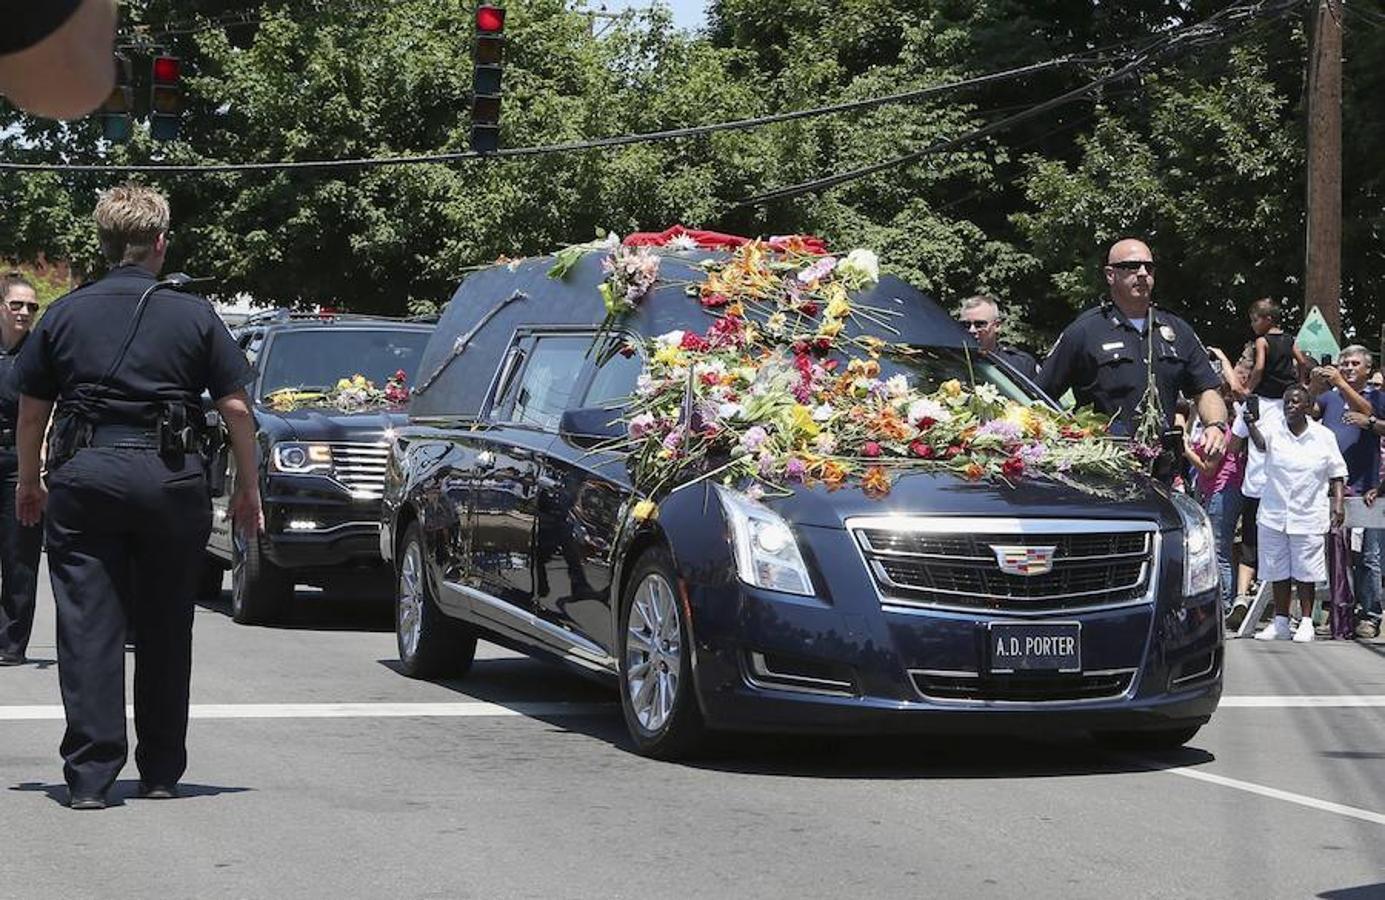 El funeral de Mohamed Alí, en imágenes